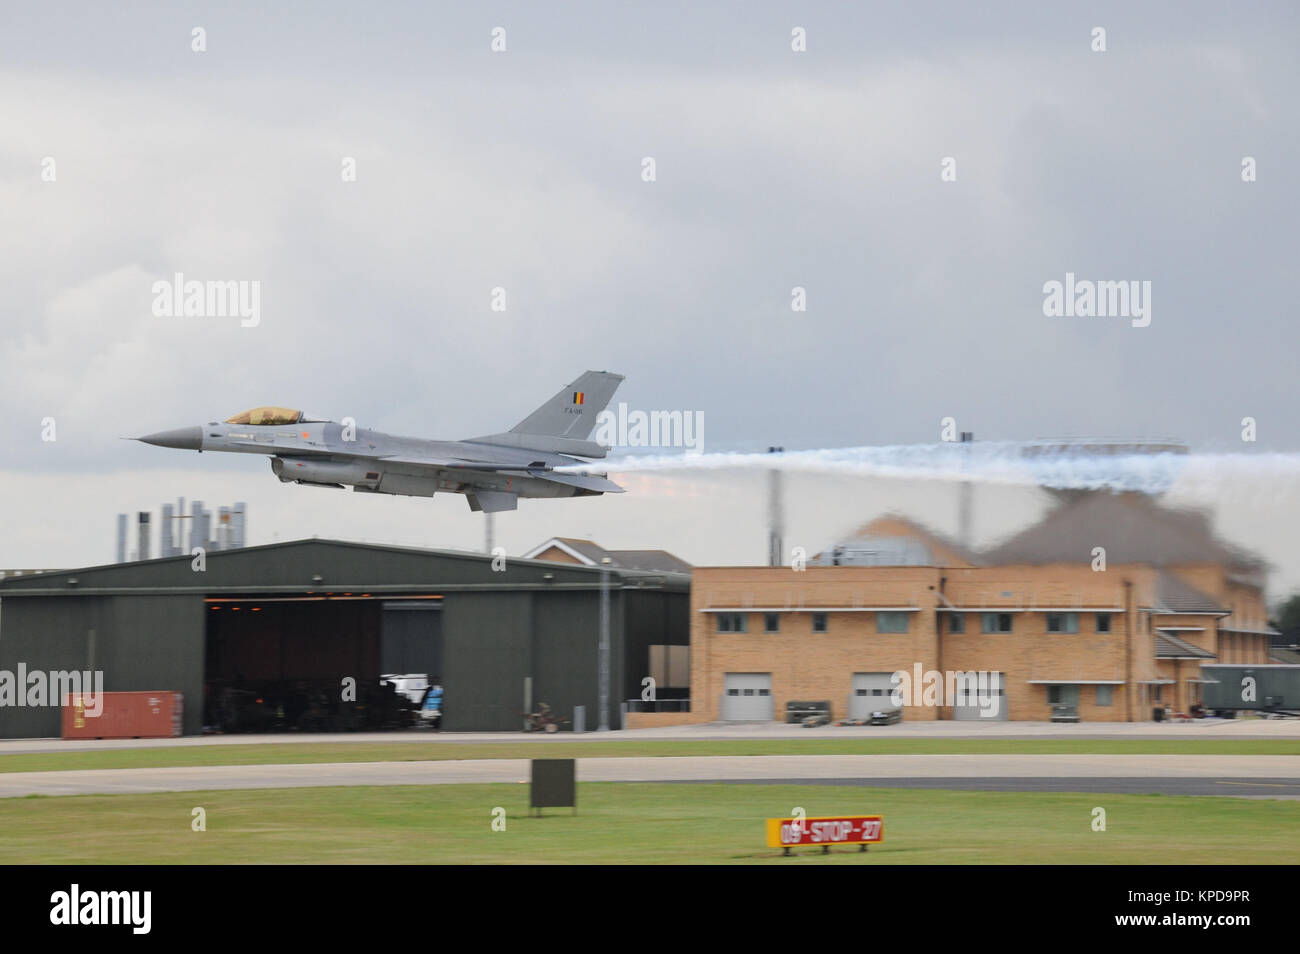 Belgian Lockheed Martin General Dynamics F-16A Fighting Falcon - Stock Image